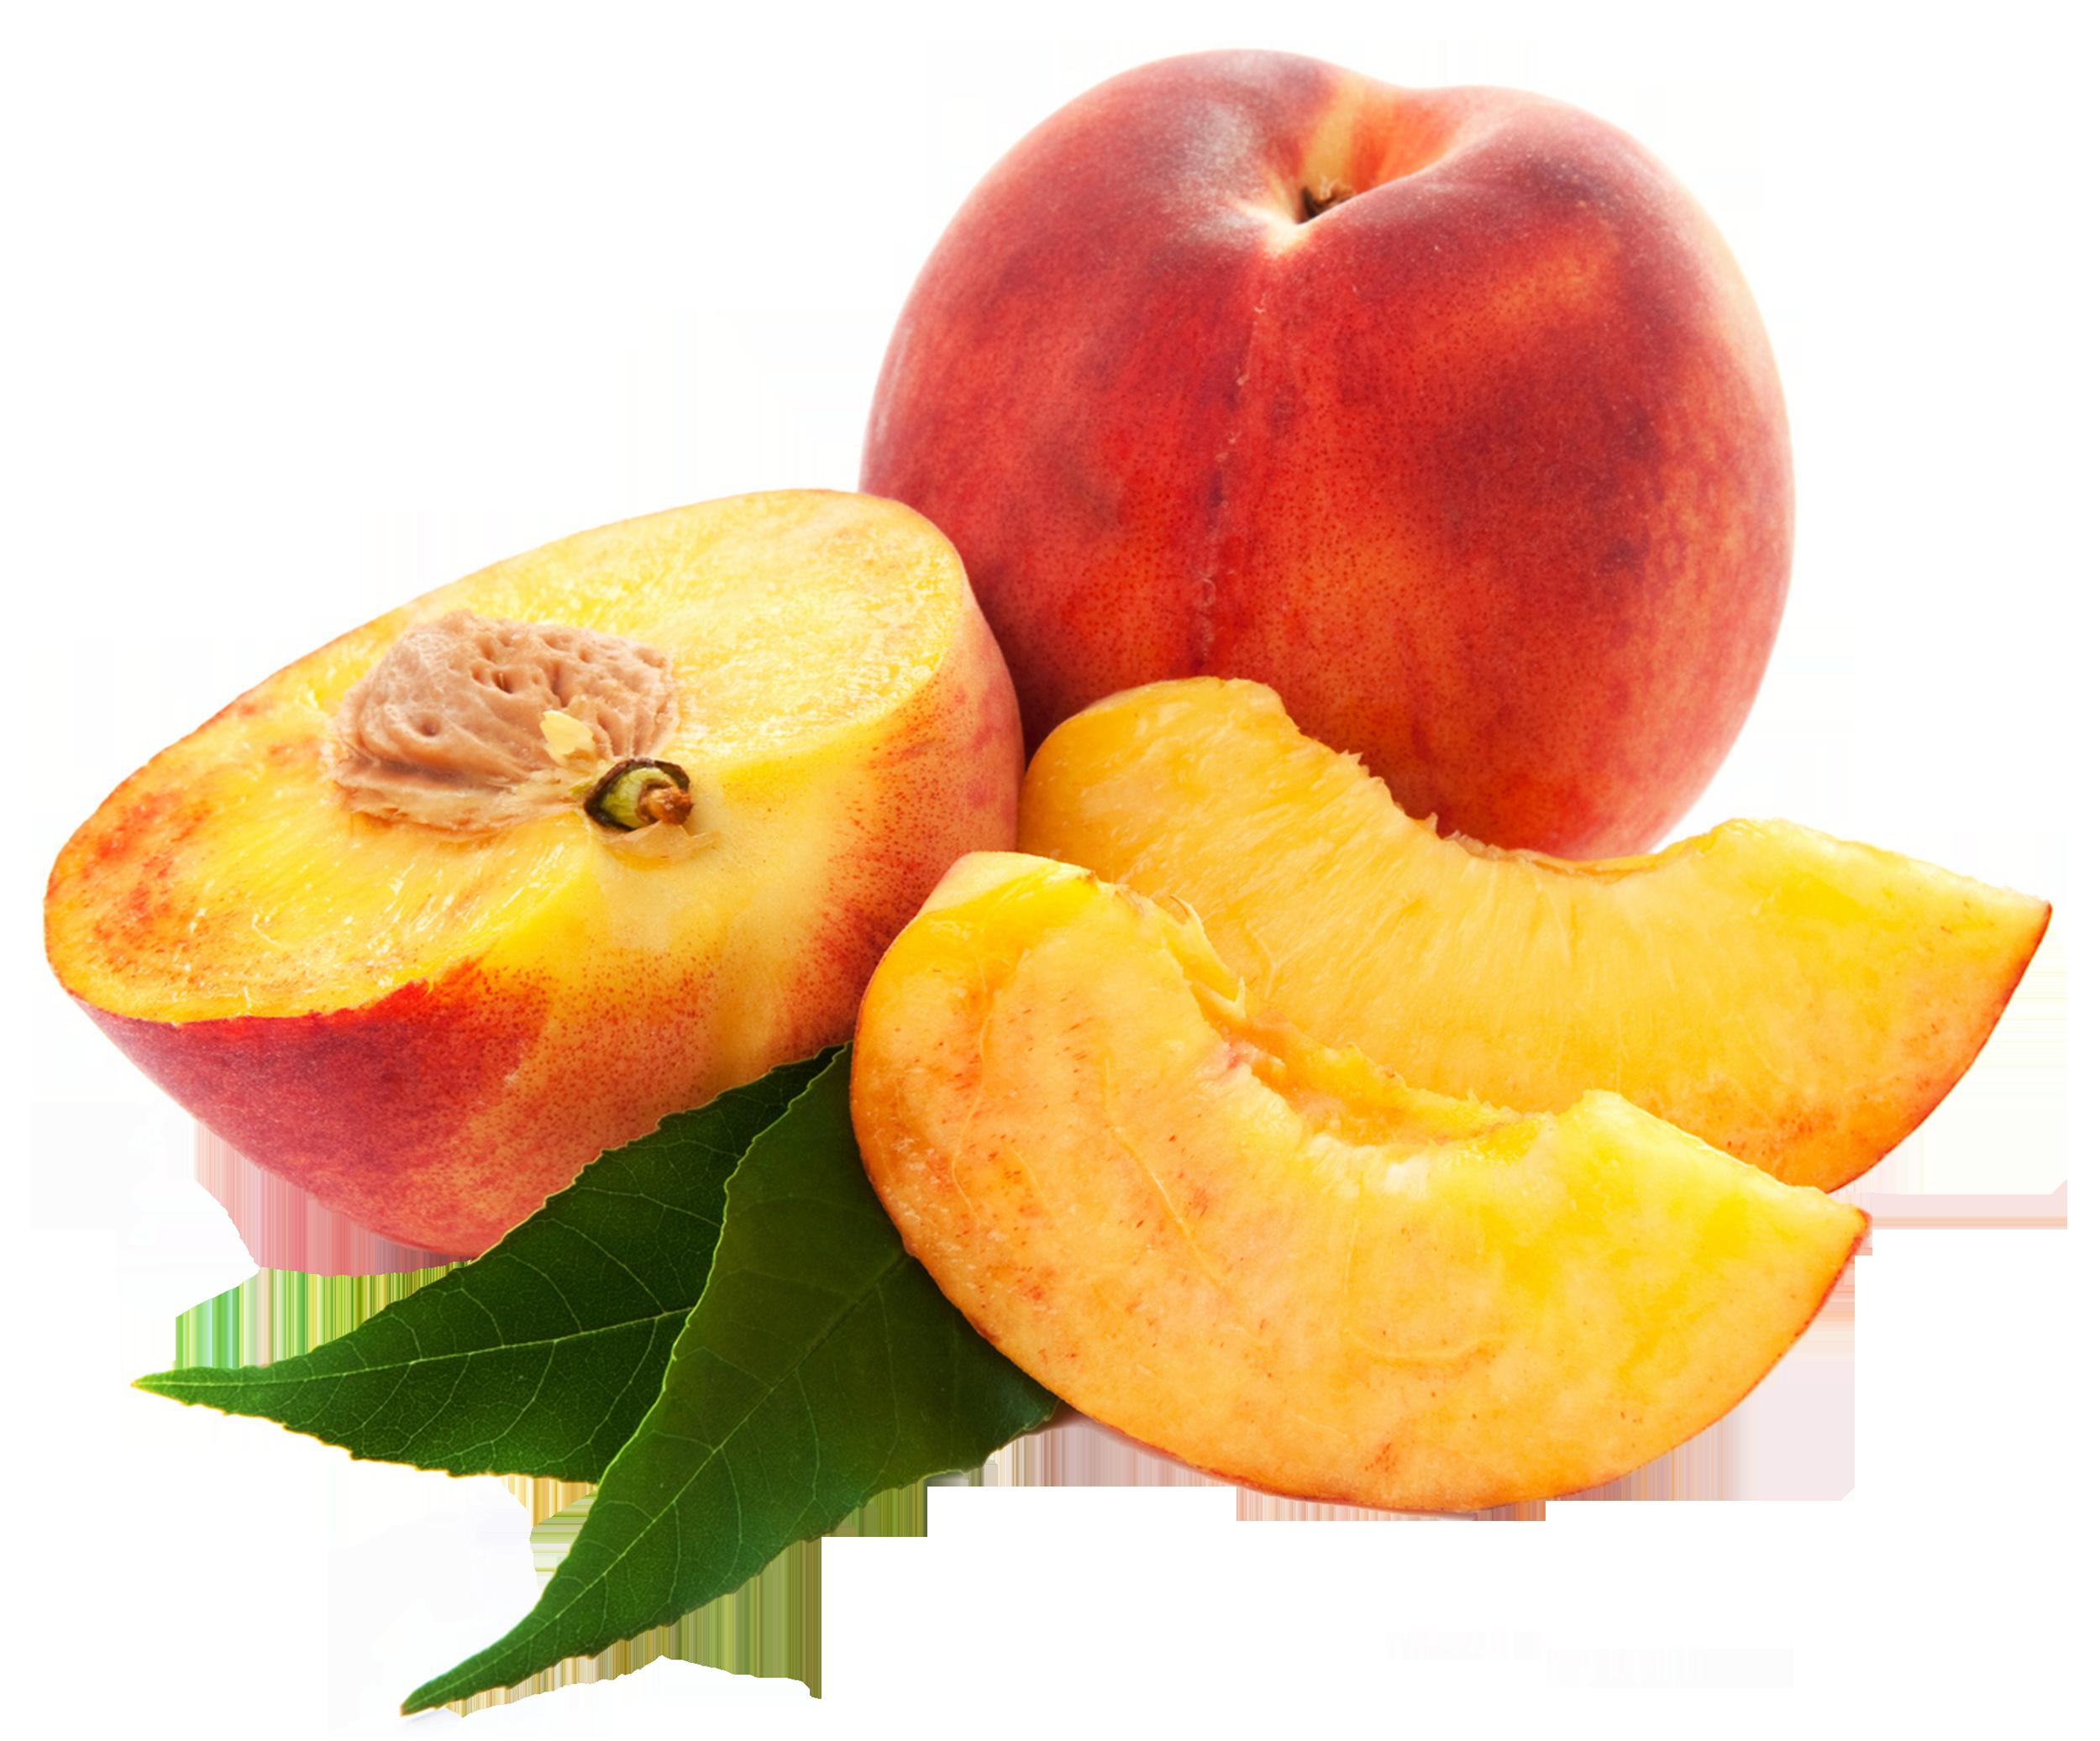 Peach clipart peach fruit. Large peaches png gallery